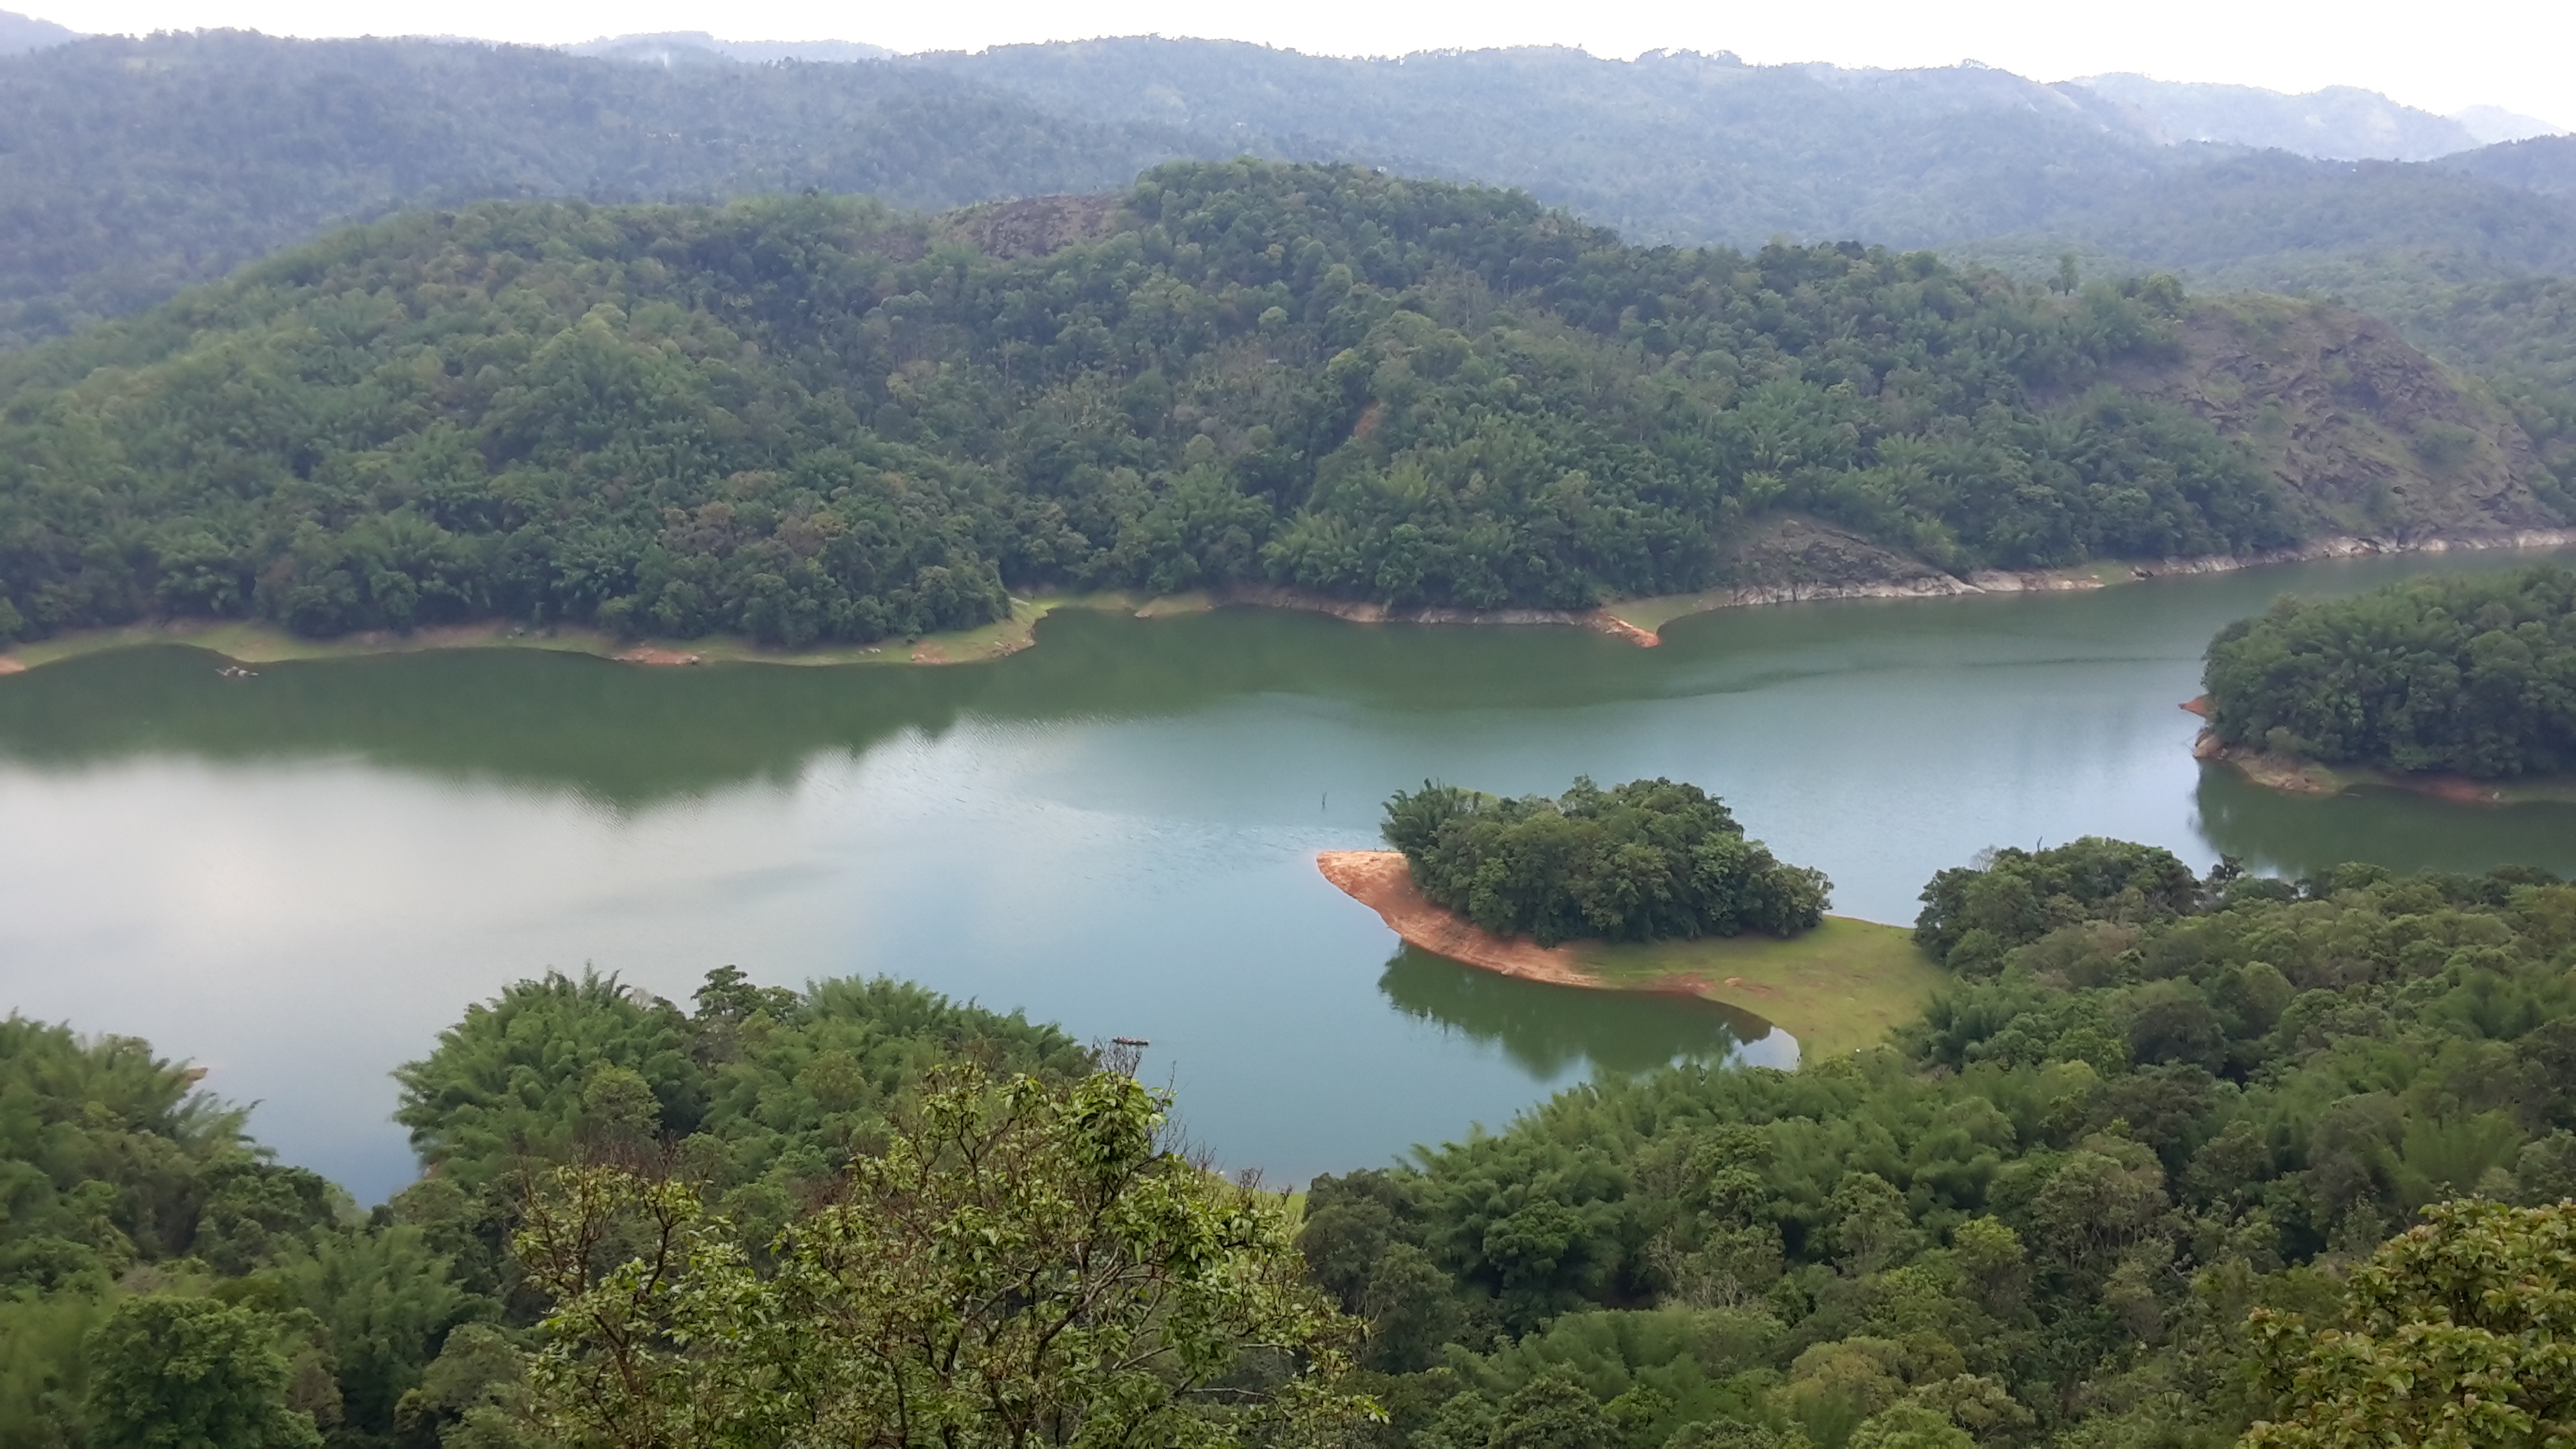 Trekking & Stay at Jungle Lodges at Chinnar Wildlife Sanctuary